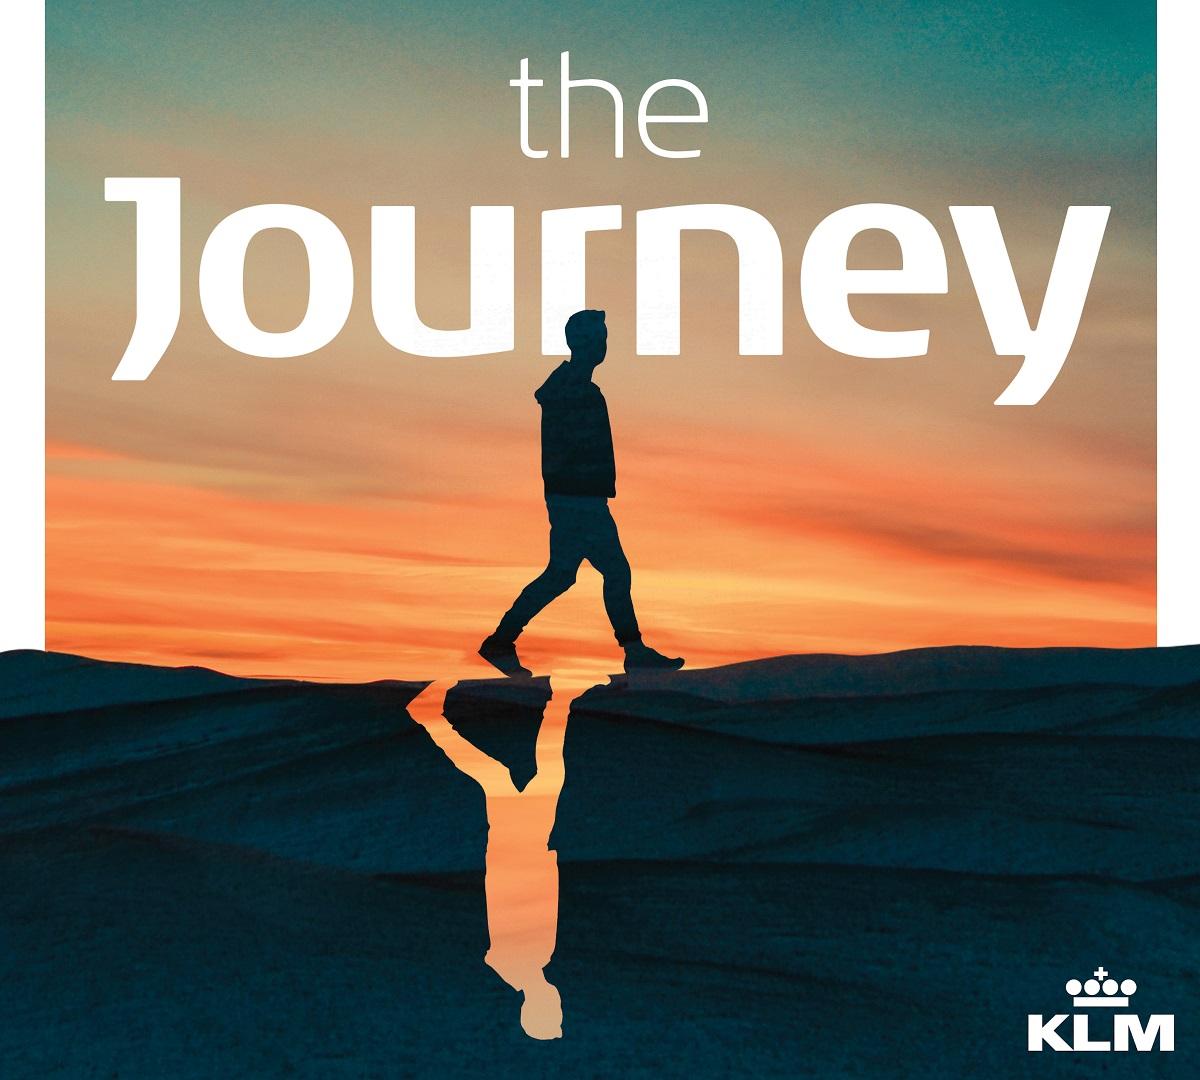 klm shares unique travel experiences through the journey podcast